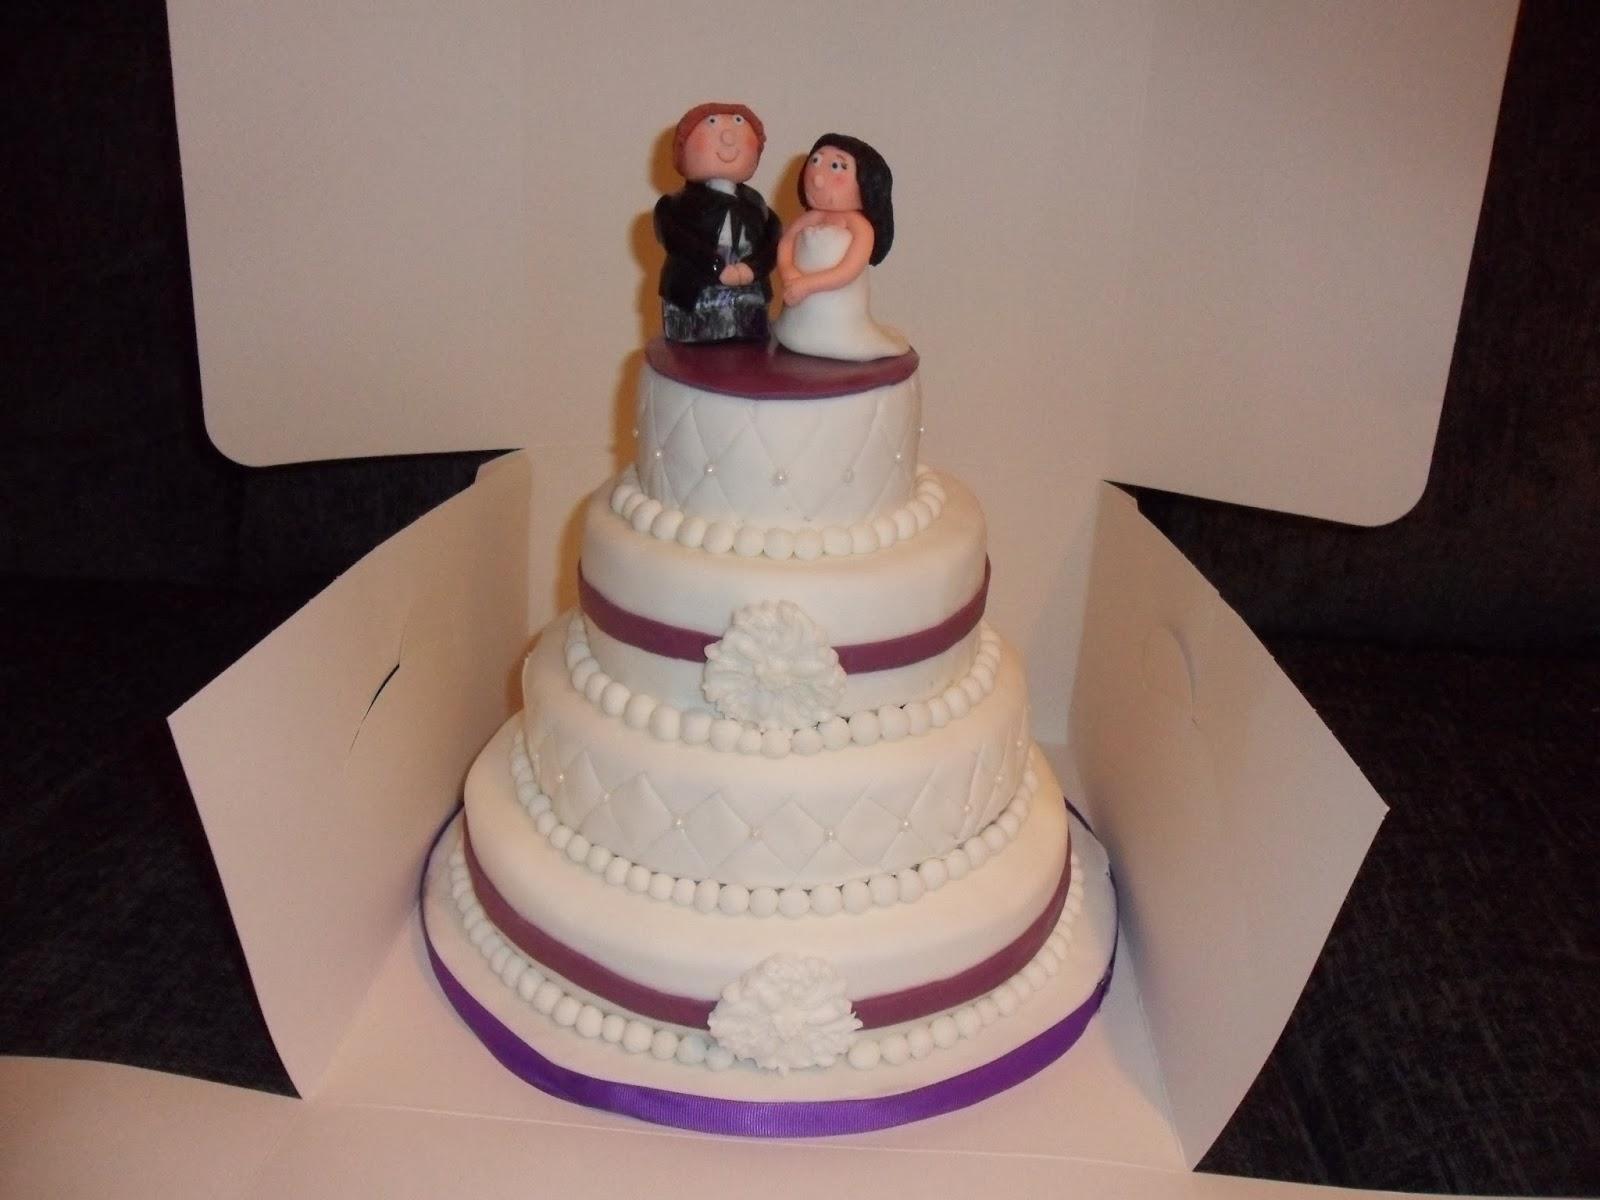 Novelty Cakes graduation army helmet and wedding